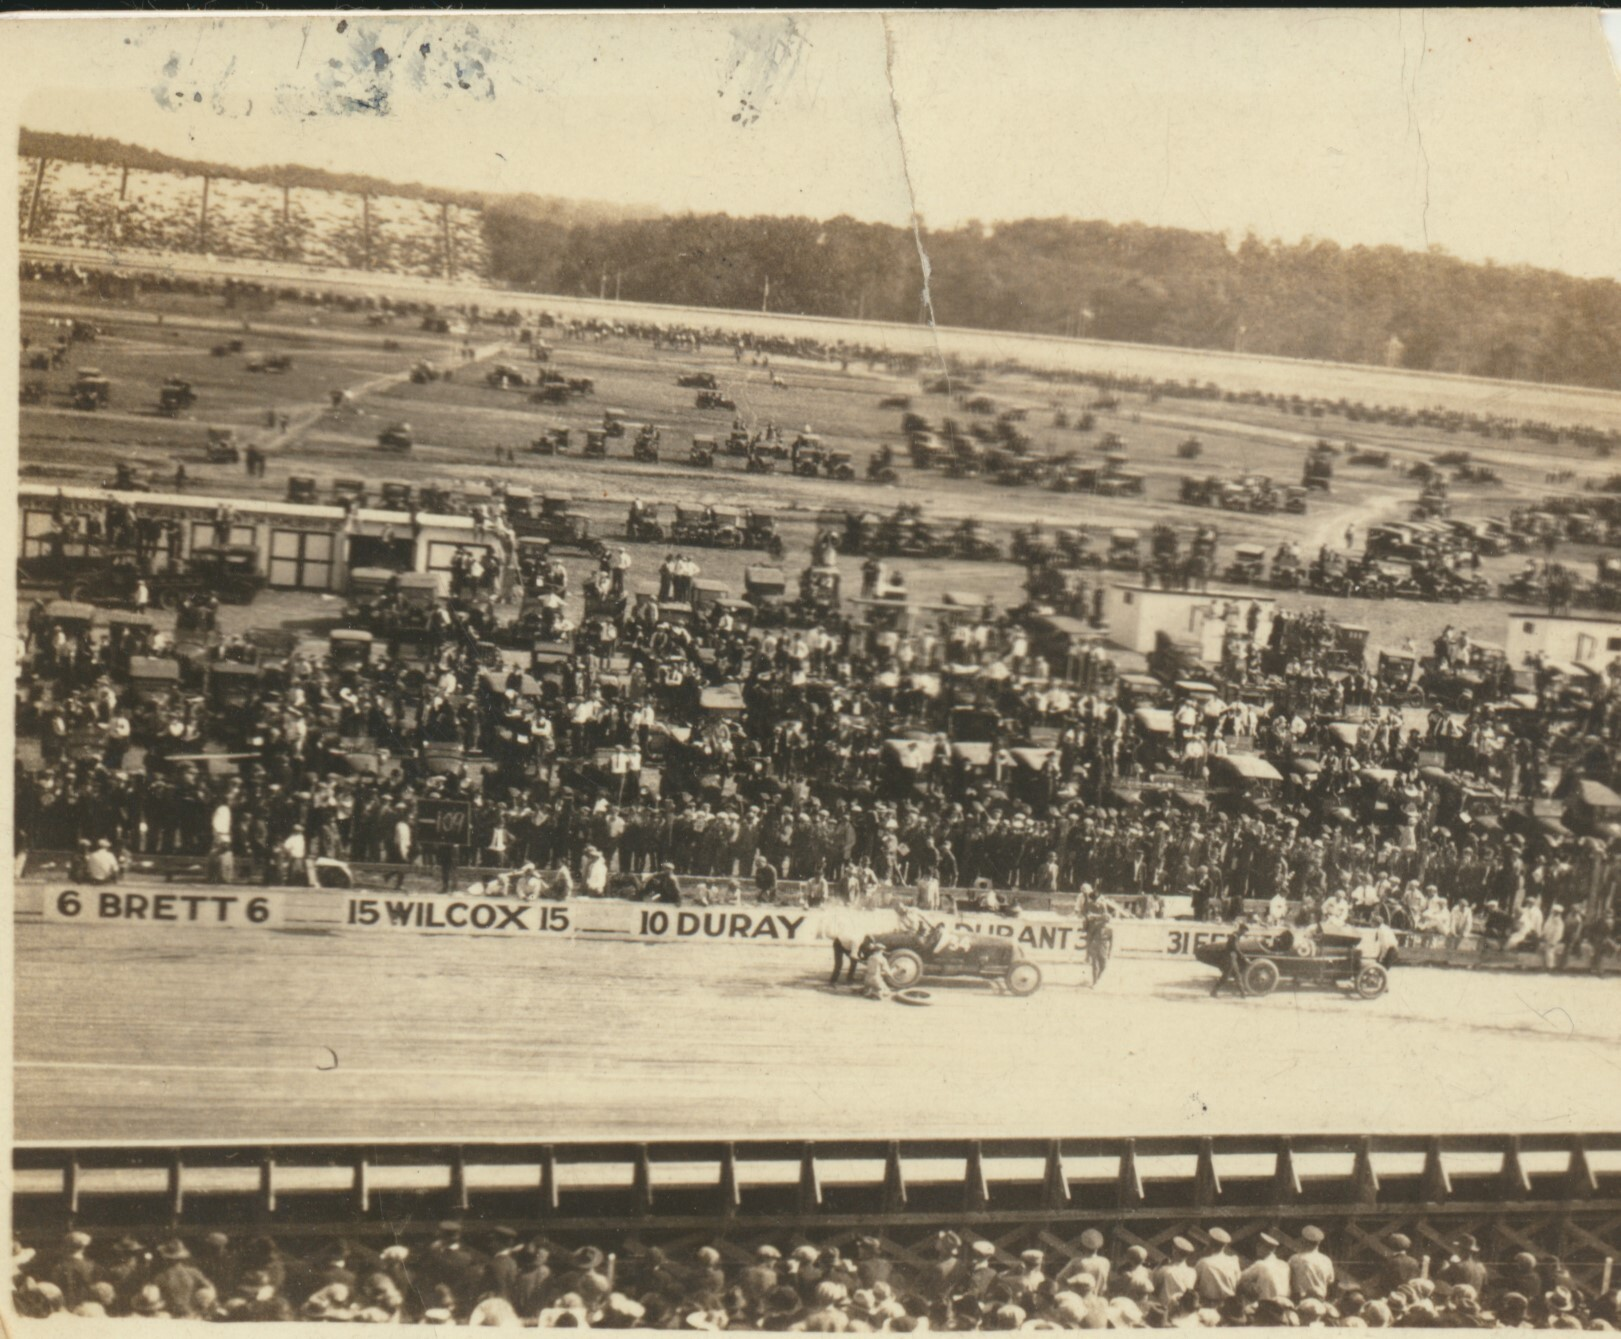 bannister complex racetrack 2